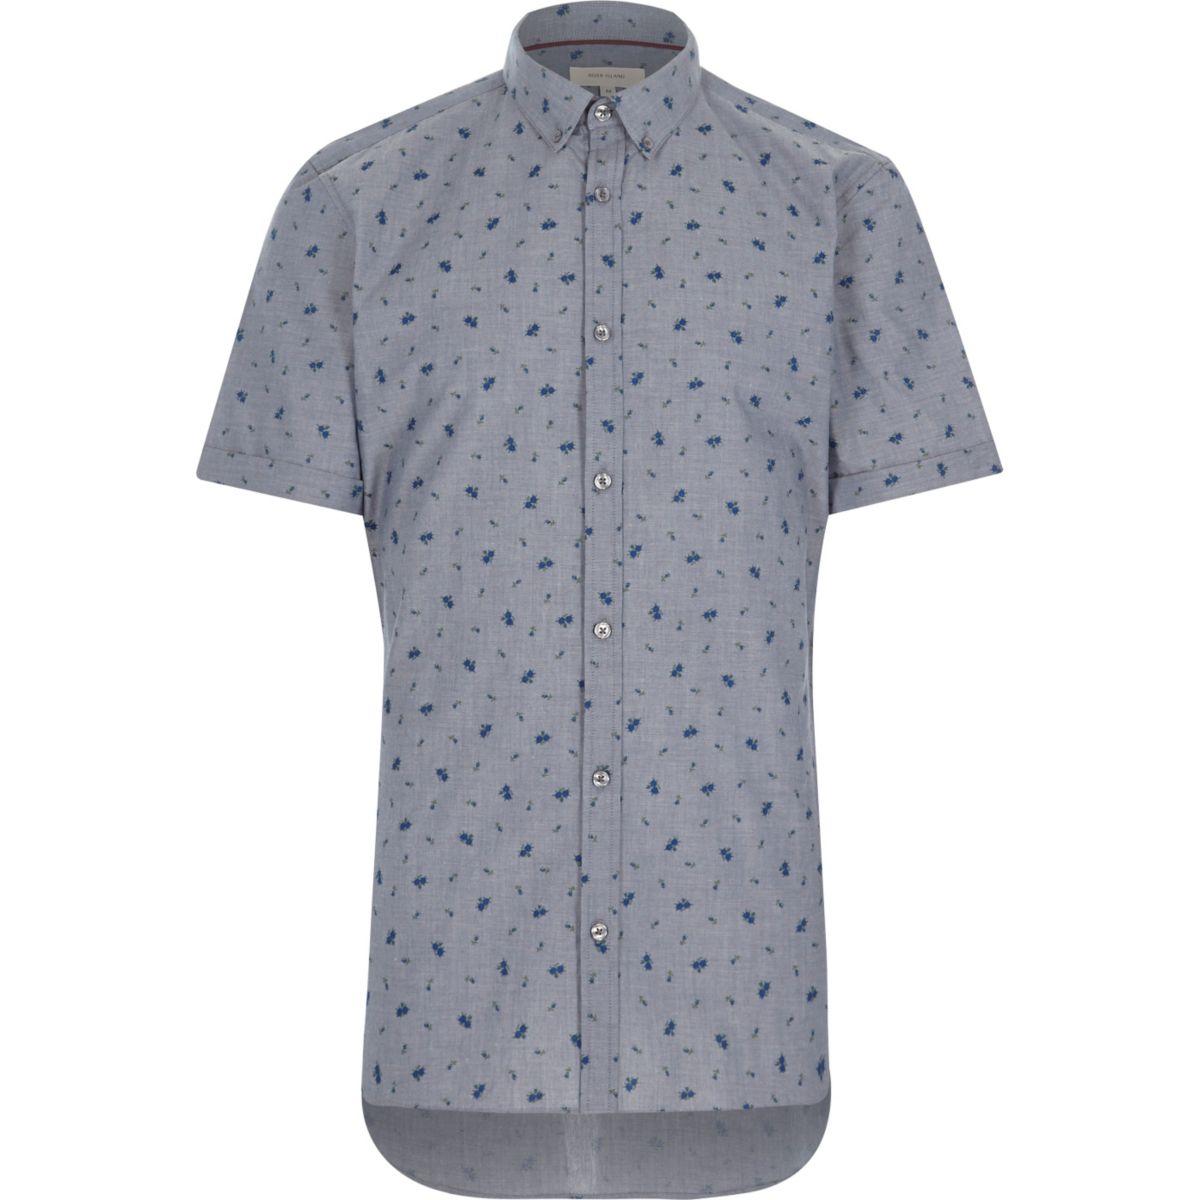 Blue floral print short sleeve shirt